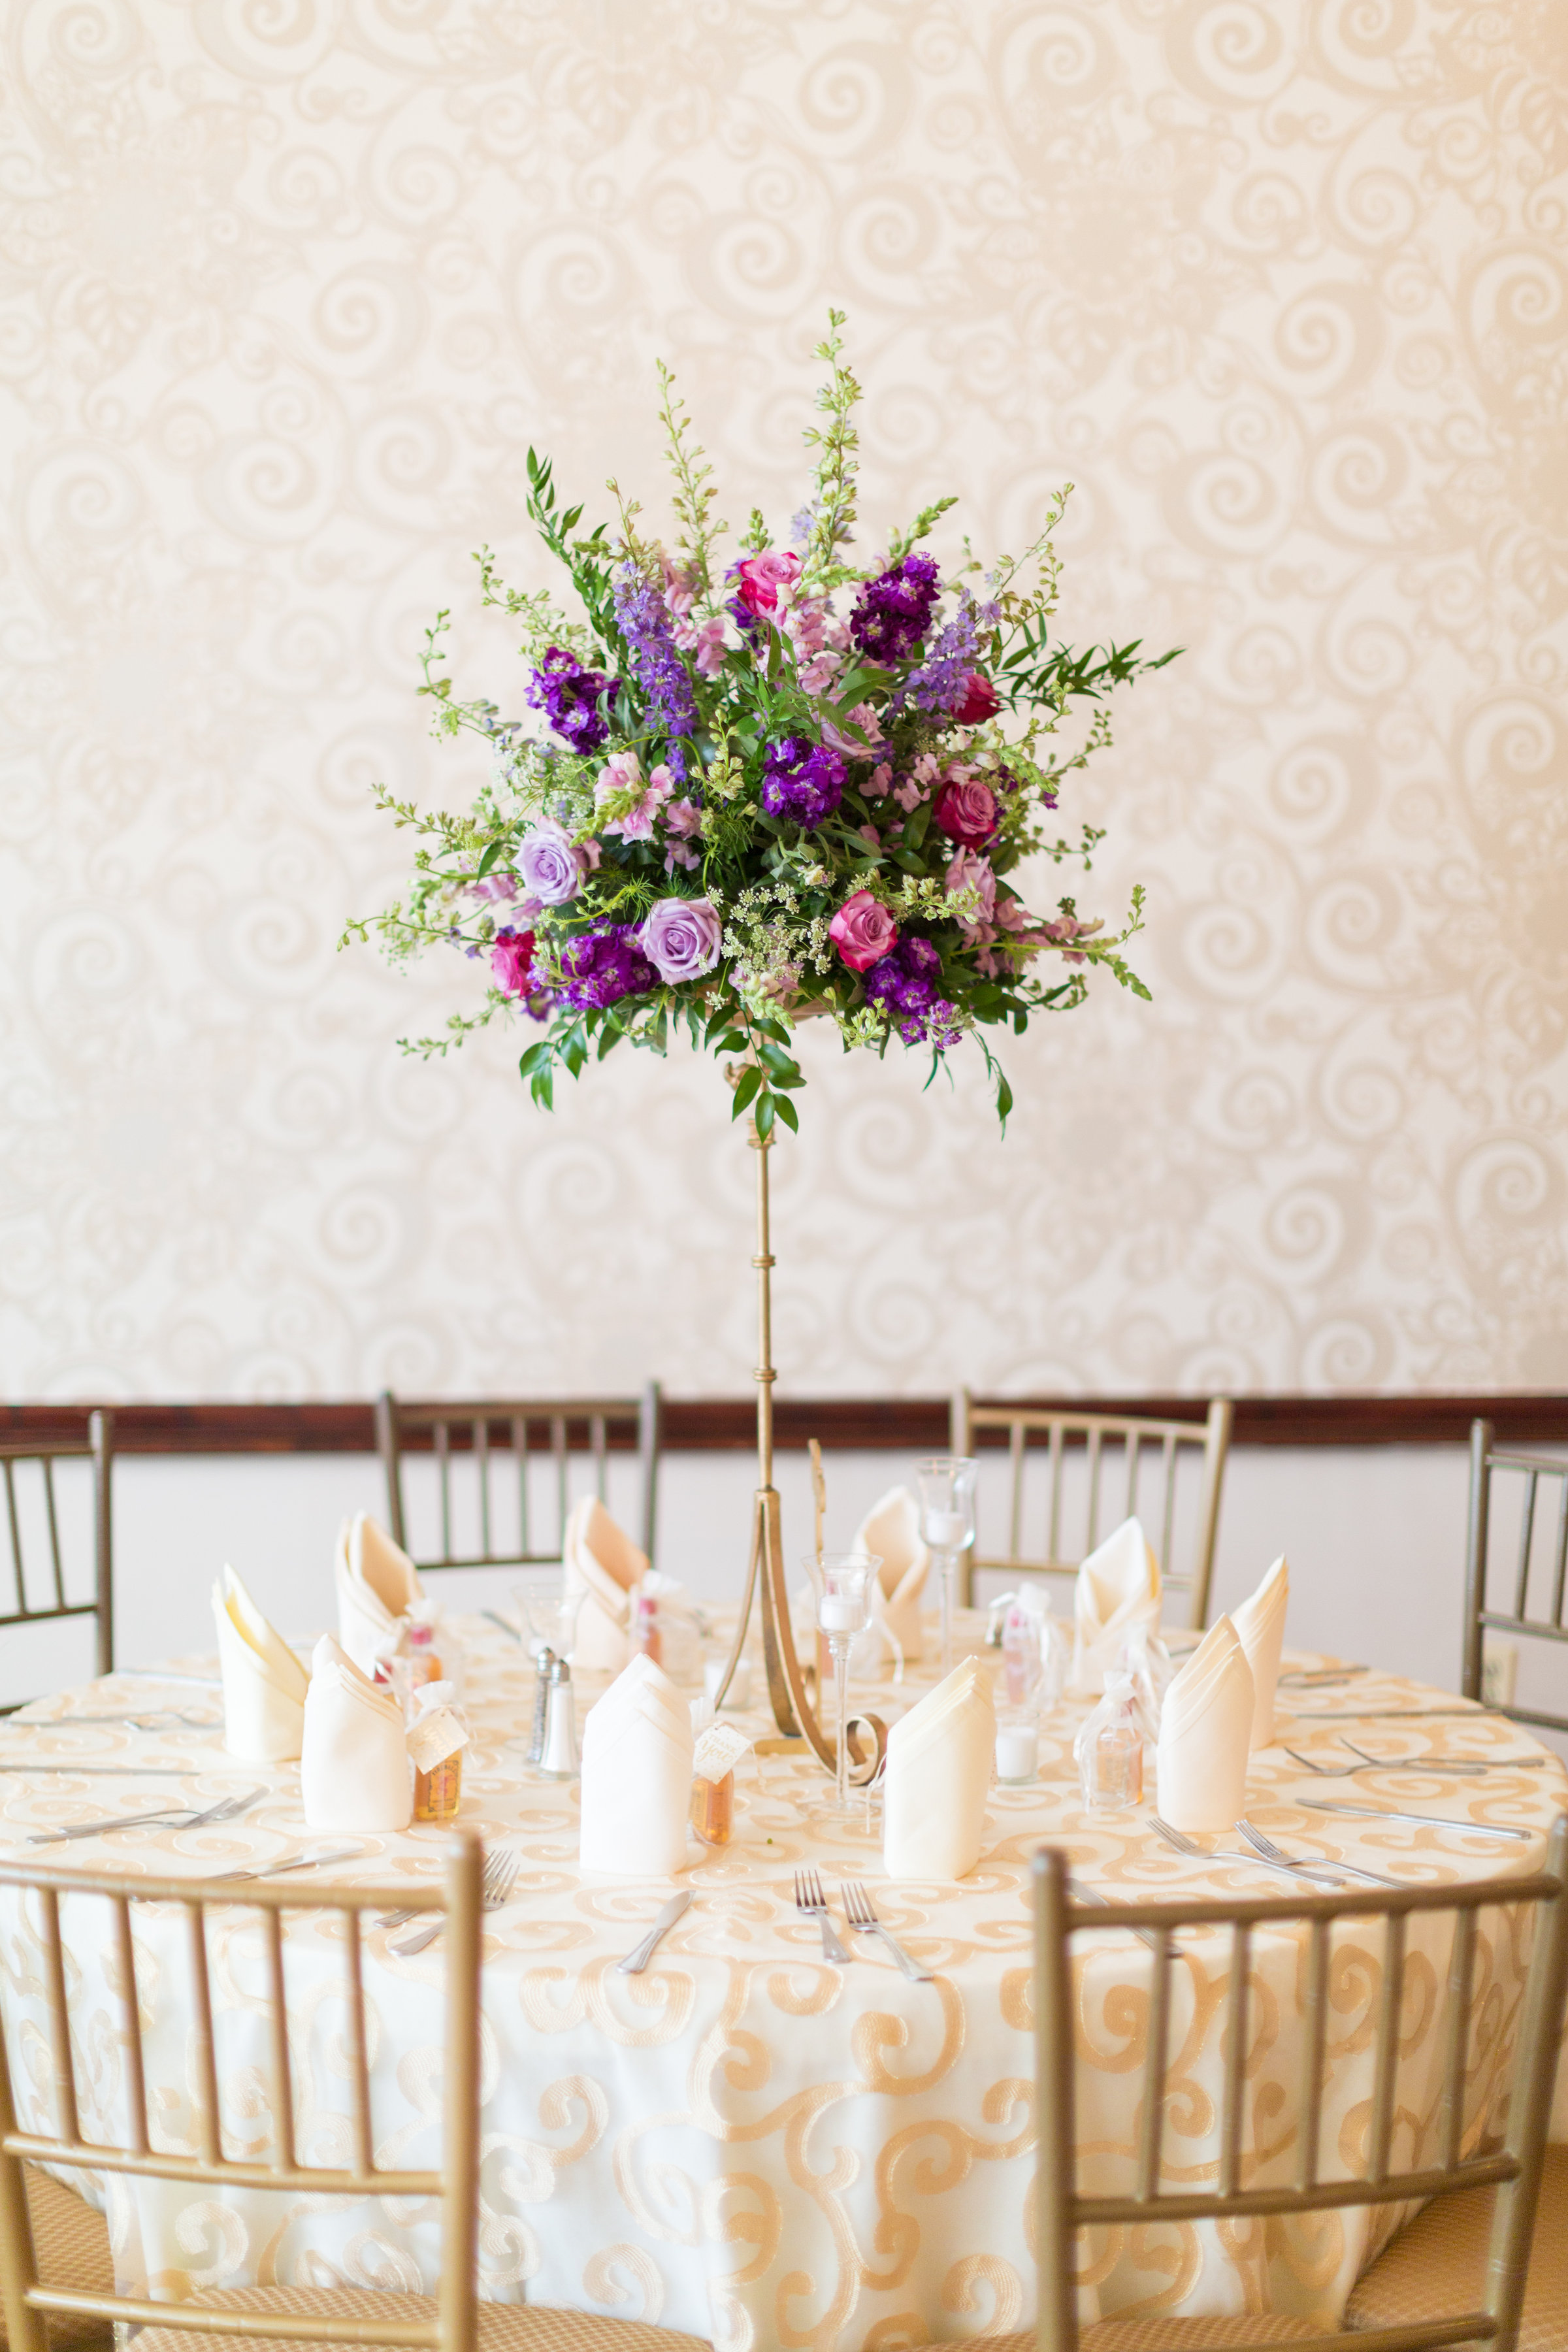 NJ Wedding, Running Deer Golf Club, Purple Flowers, Lavender Wedding, Florist, A Garden Party, Compote, Centerpiece, Tami & Ryan Photography